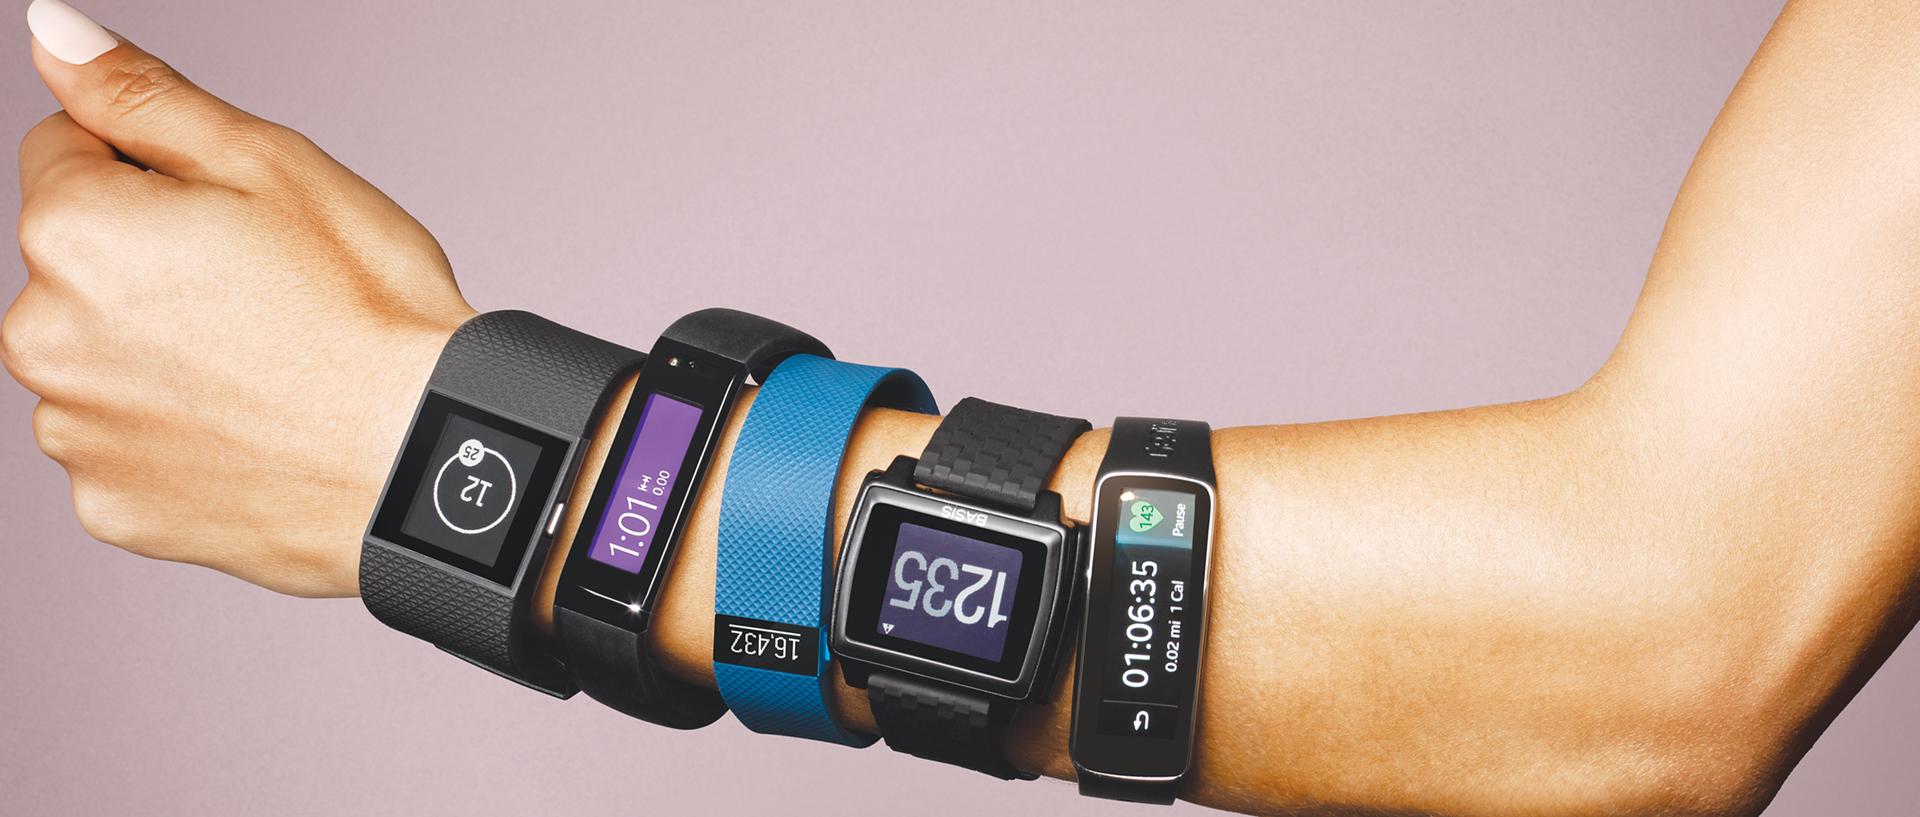 Fitness Tracker Werbegeschenk